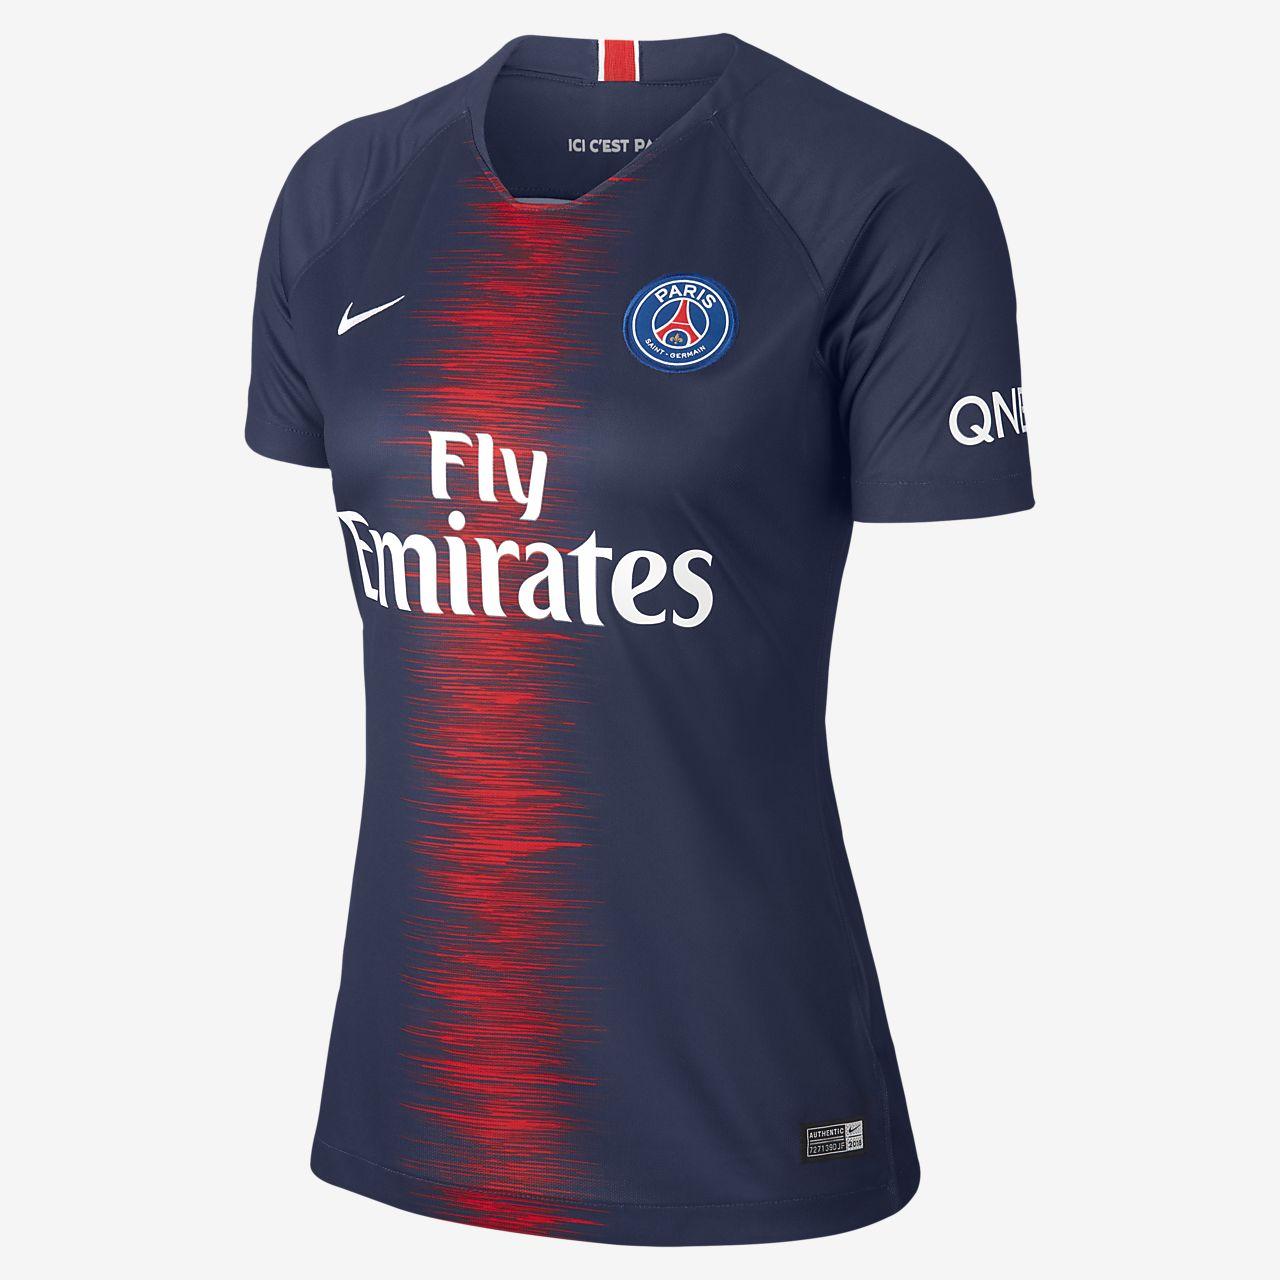 4ac716b77aa 2018 19 Paris Saint-Germain Stadium Home Women s Football Shirt ...